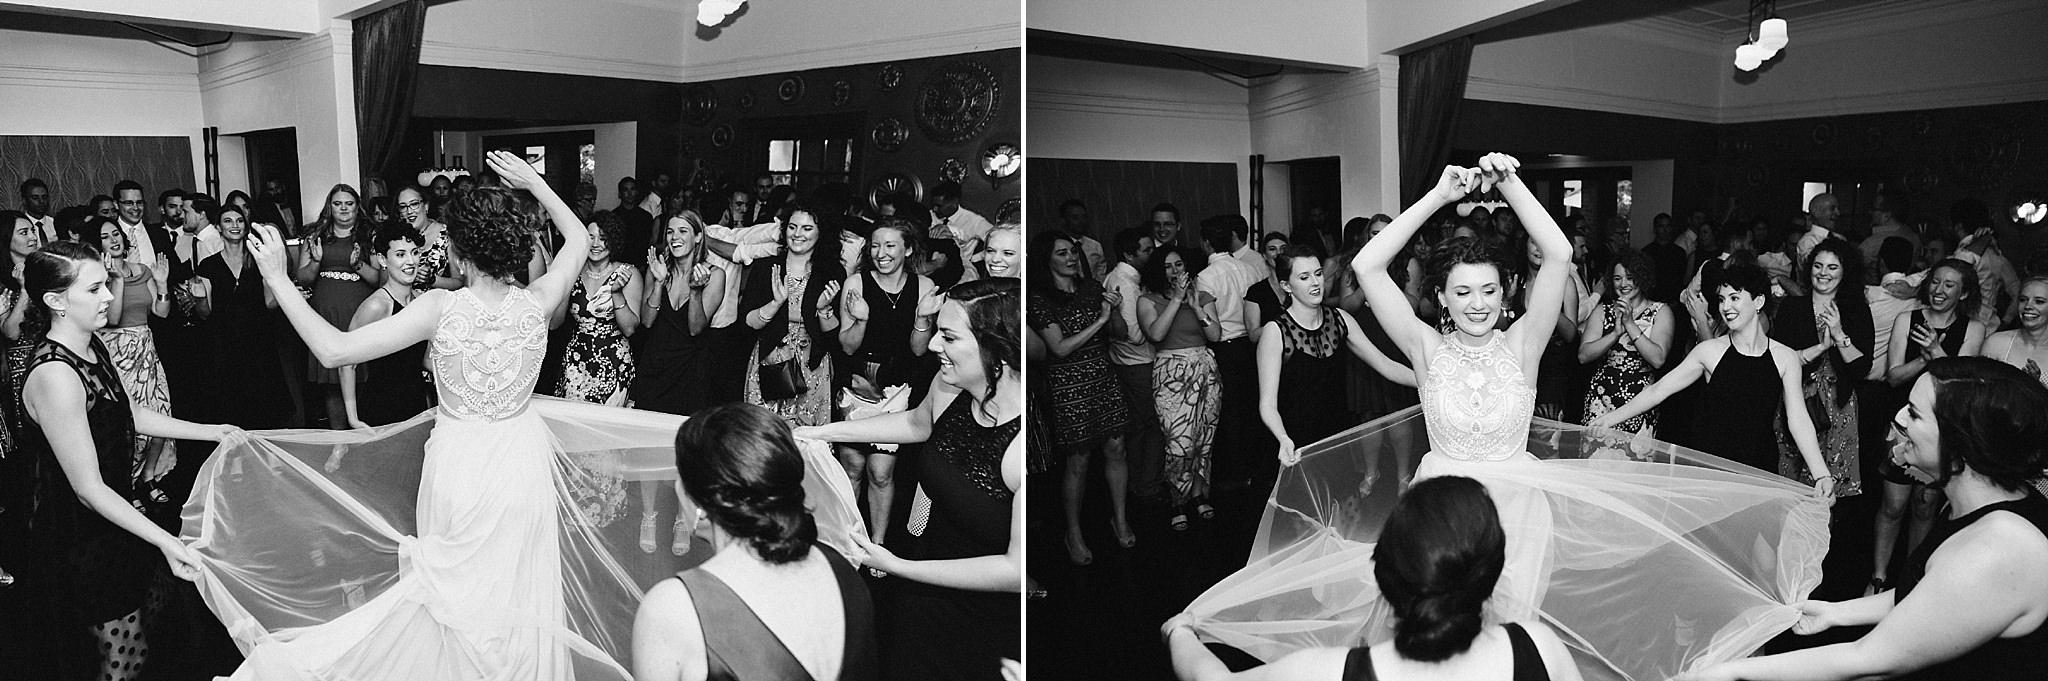 ANU Wedding, Borwal Wedding Photographer, Canberra Photographer, Canberra WEdding, Canberra Wedding Photographer, Hotel Hotel WEdding, Jewish Wedding Canberra, Johanna Mroz Jewellery, Maleny Wedding Photographer, New Acton WEdding, Parlour Wine Room Wedding, Shae Estella, Shae Estella Photography, Sunshine Coast Wedding Photographer, The Floral Society, Wedding Photography, Wedding Photography Canberra, Wedding Photography sunshine coast, Wendy Makin